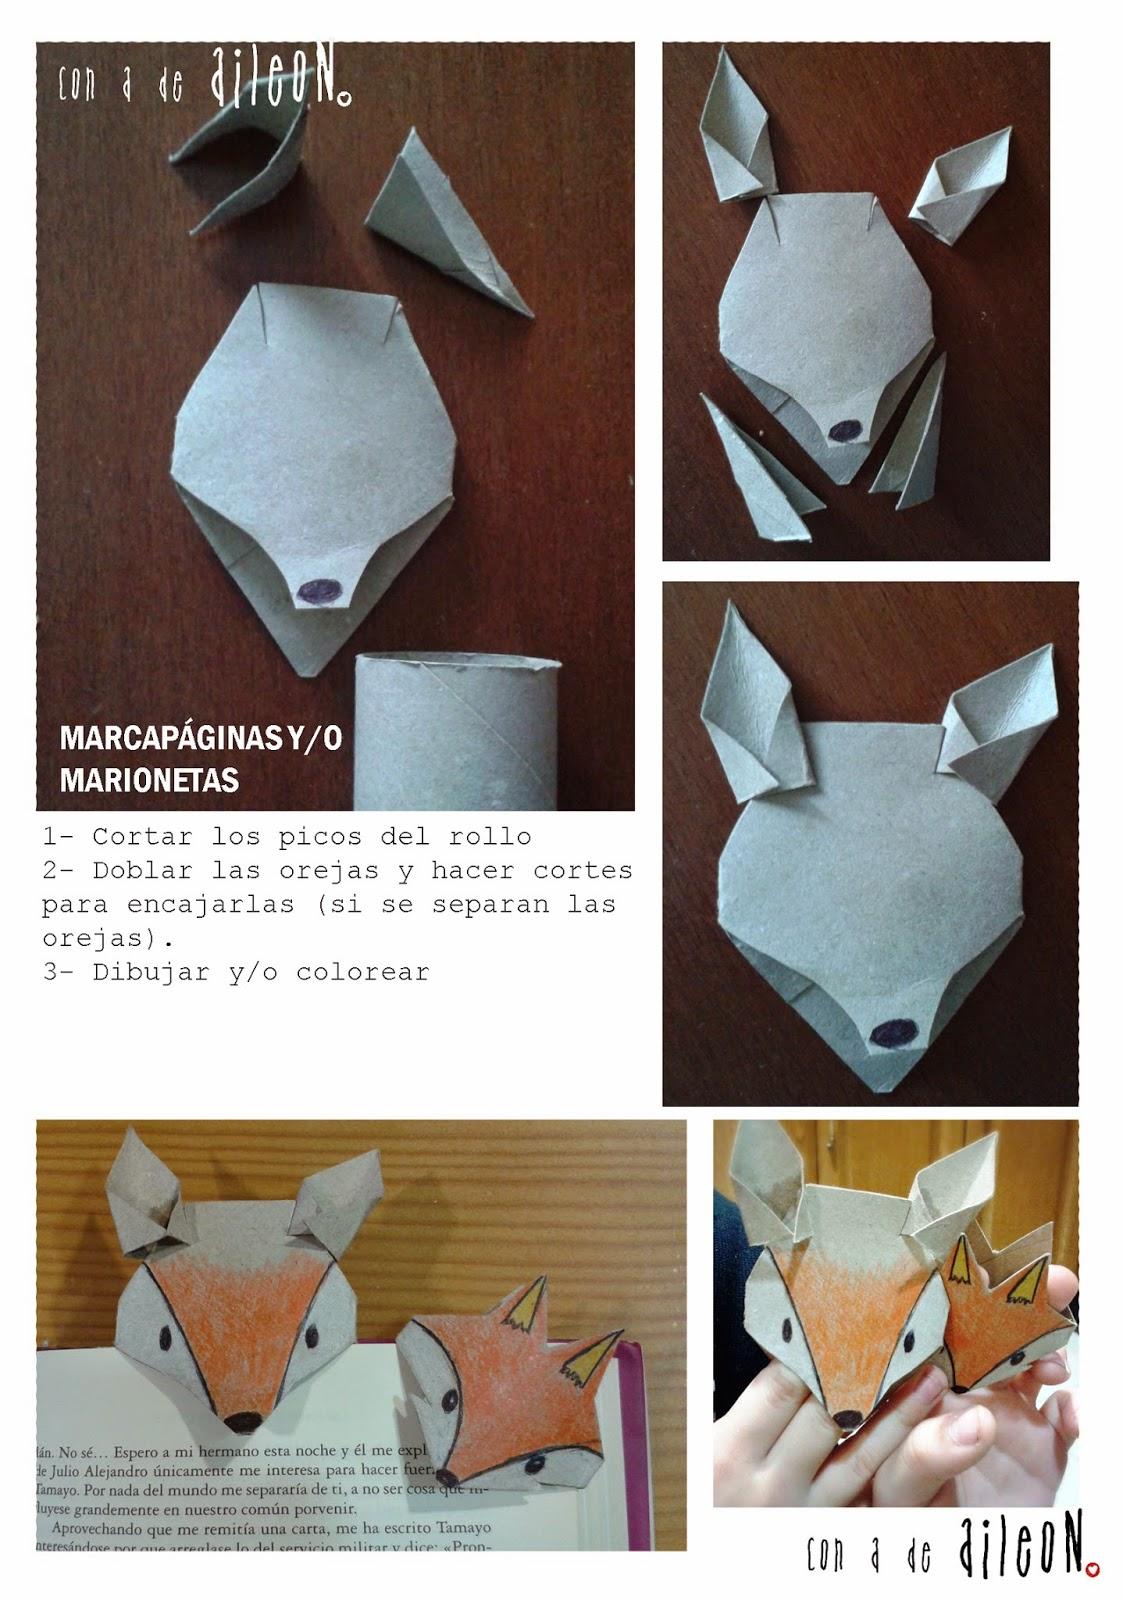 Marcapágina-marioneta zorro con tubos de cartón